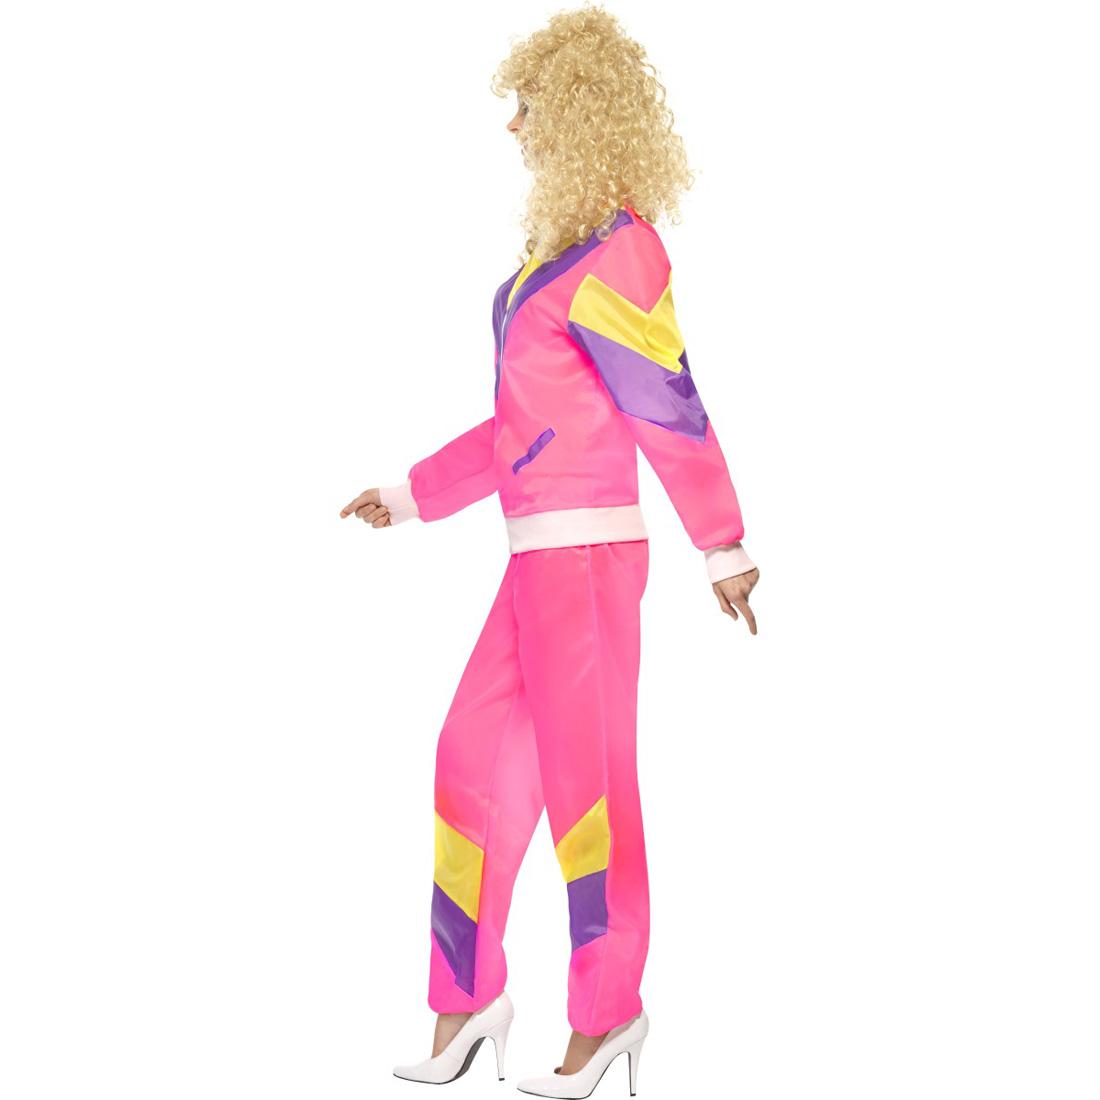 trainingsanzug kost m 80er jahre outfit damen sportkost m. Black Bedroom Furniture Sets. Home Design Ideas